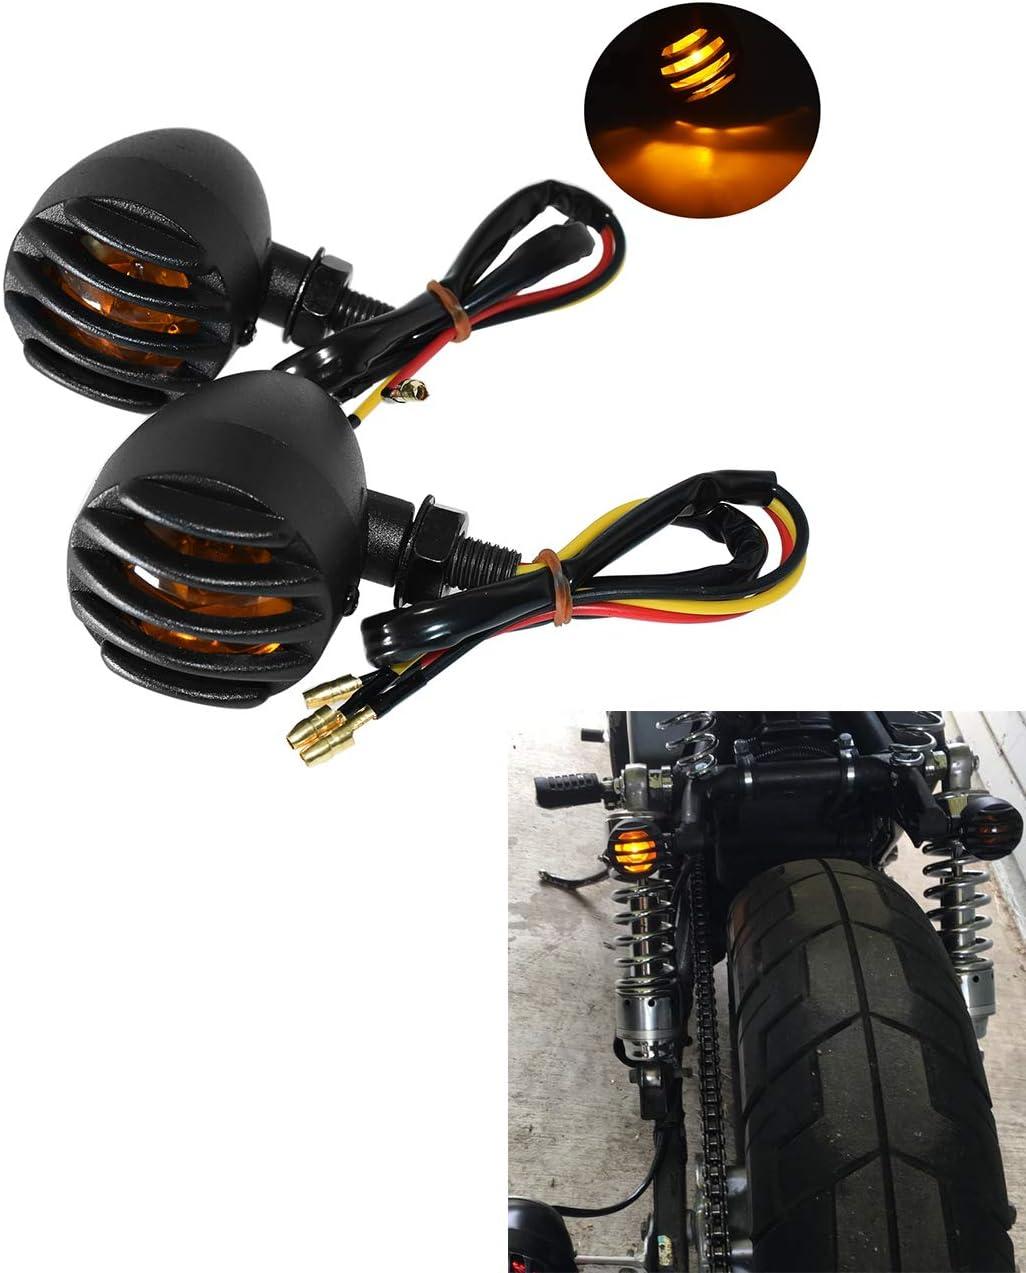 YHMTIVTU Motorcycle Turn Signals Light Bullet Heavy Duty Indicators Blinkers Lights Universial fit for Harley Kawasaki Honda Yamaha Suzuki BMW Ducati KTM Chopper Bobber Cruiser